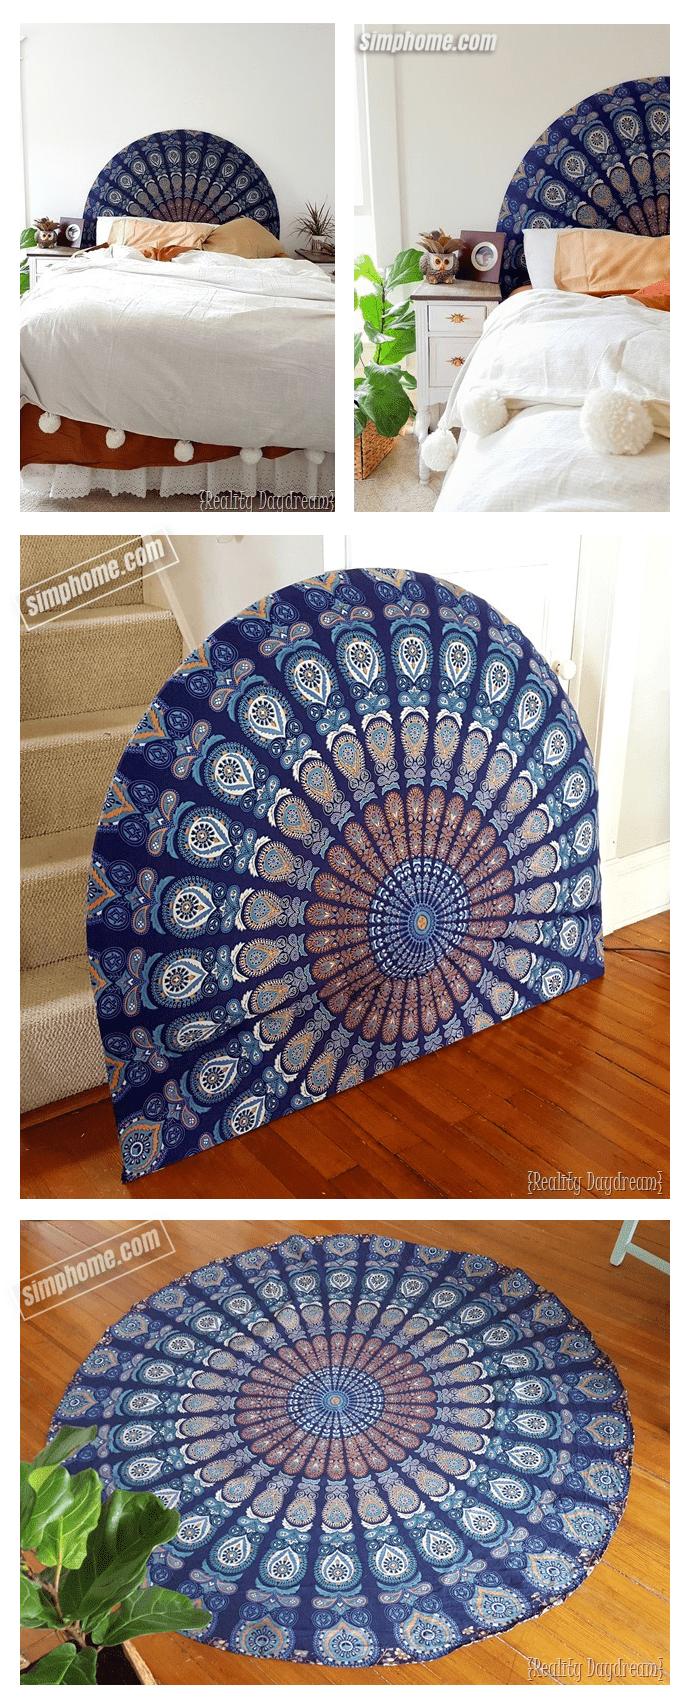 4.Simphome.com Beautiful DIY Upholstered Headboard Project idea